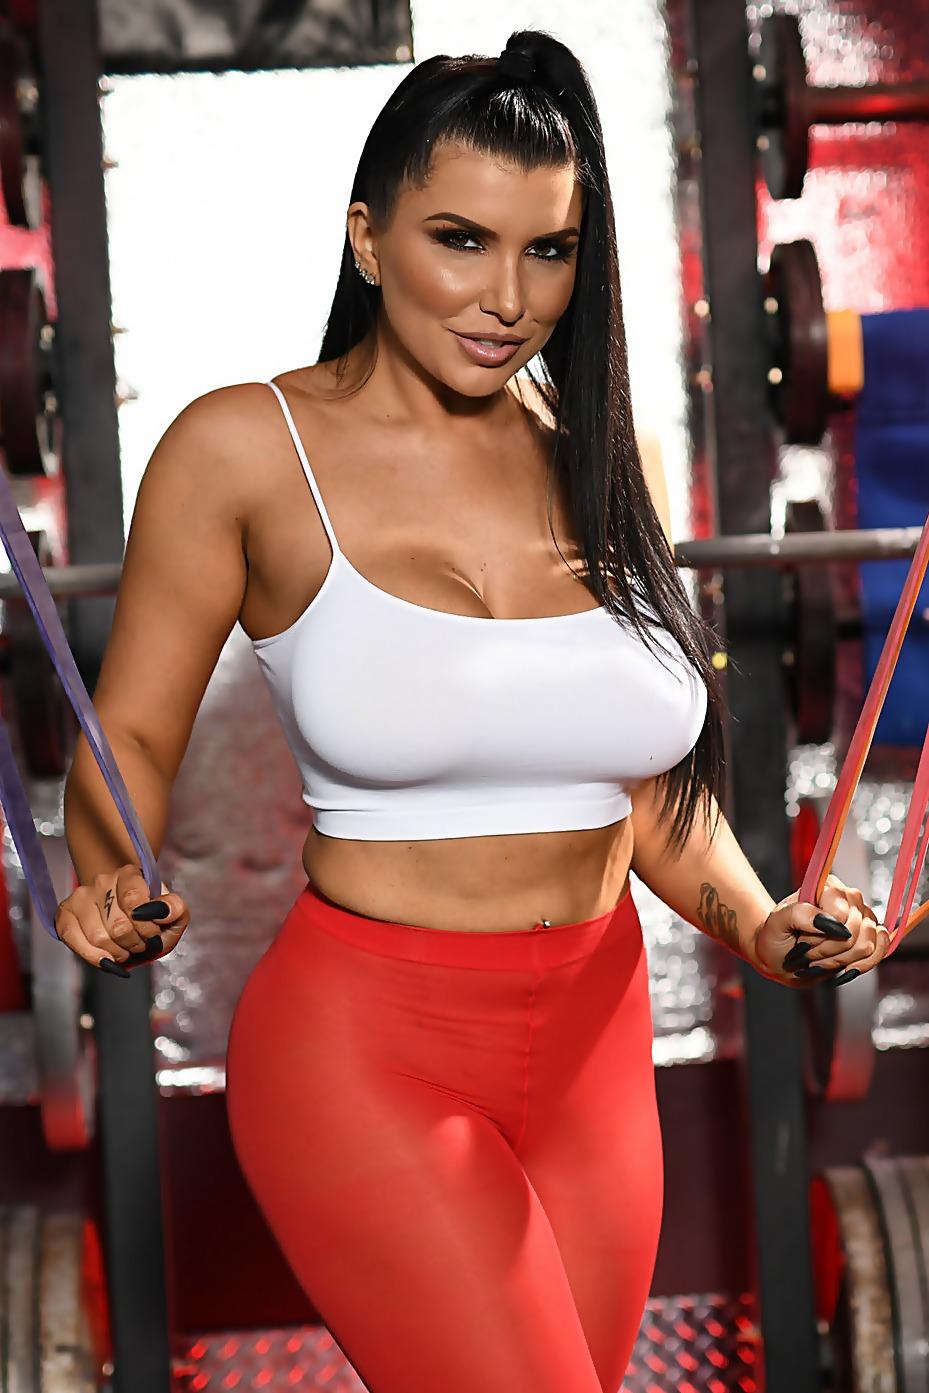 Romi Rain In The Gym